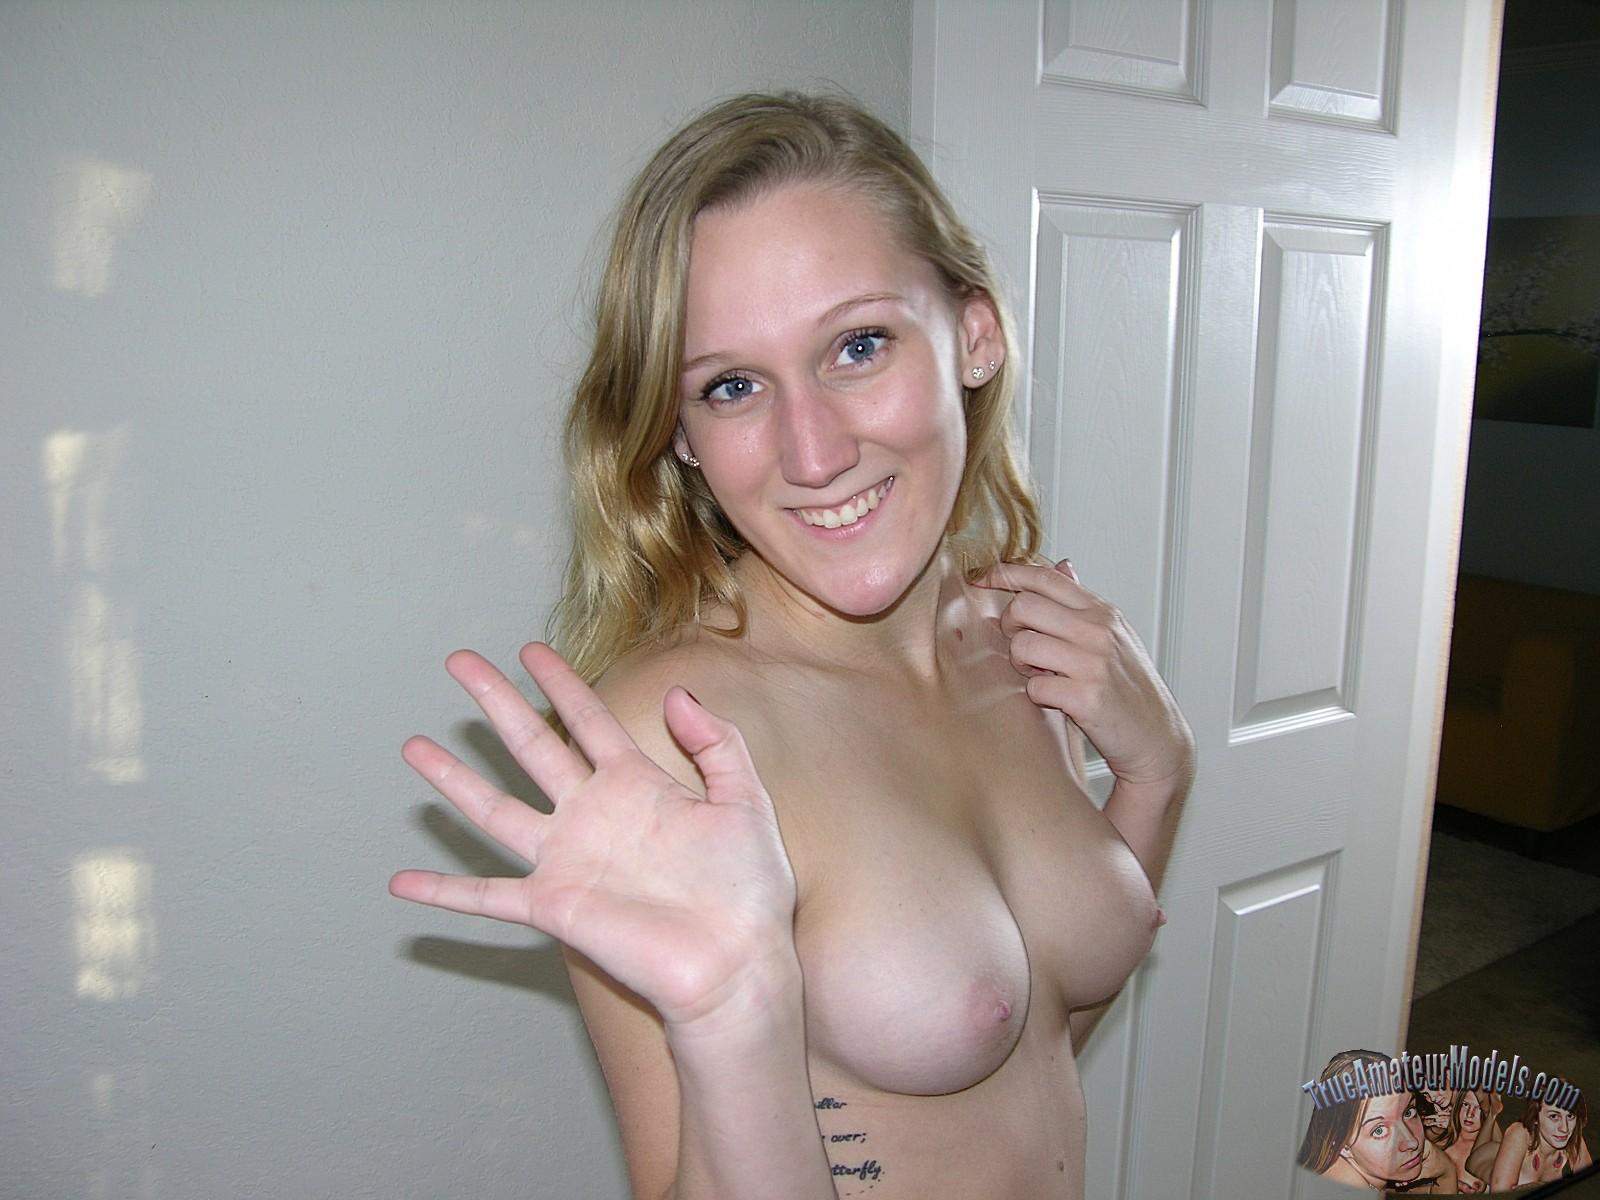 Fully nude girl on girl sex